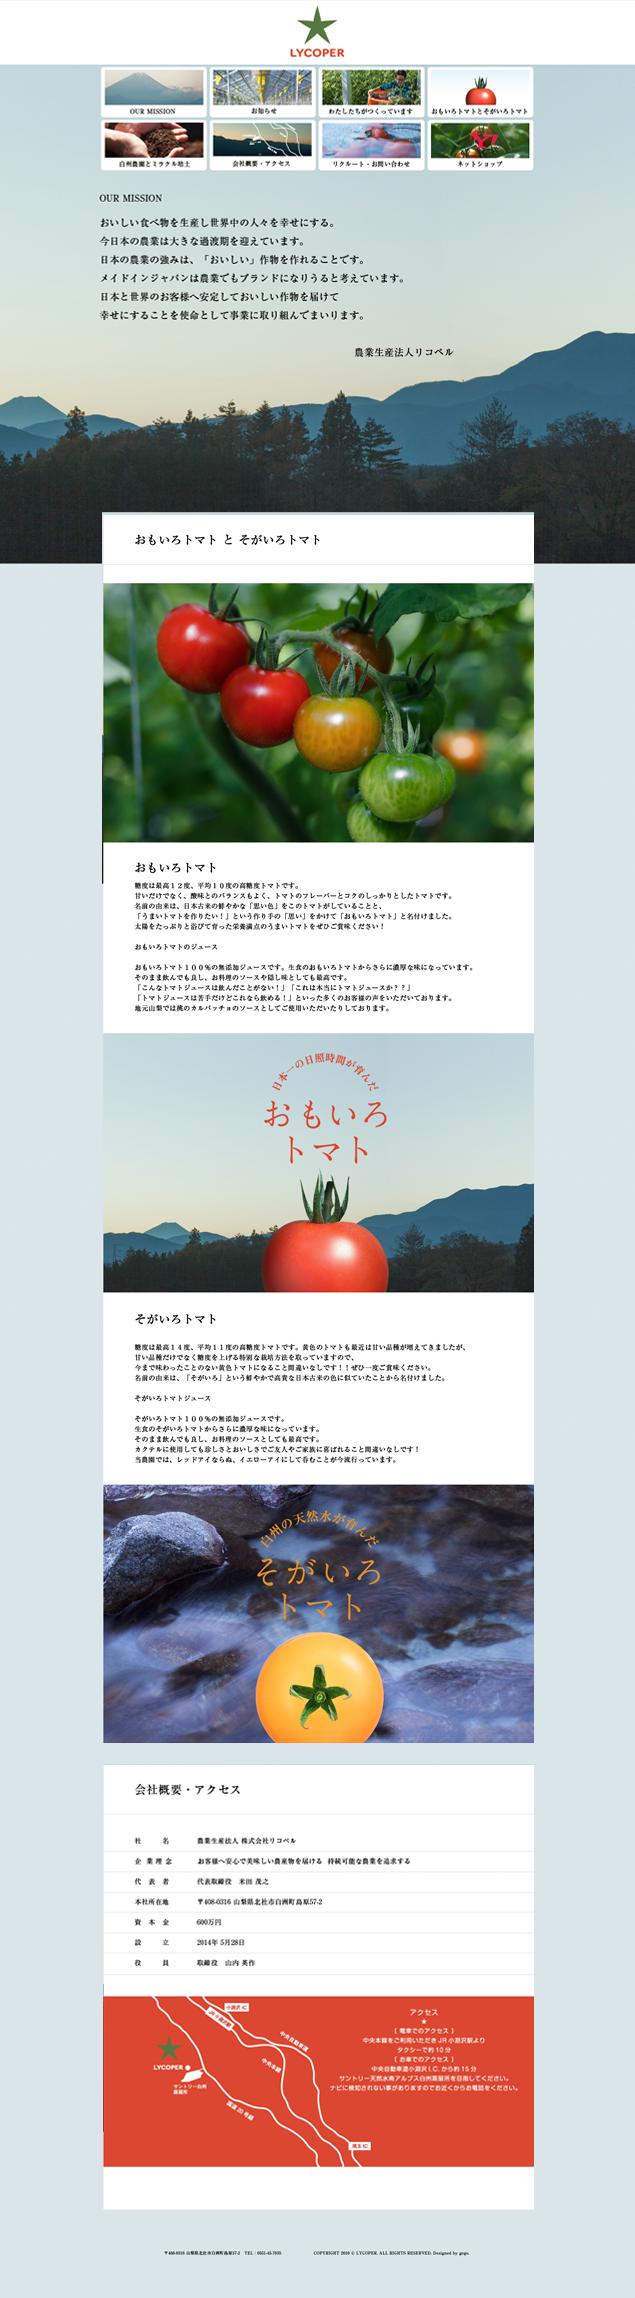 WEBデザイン 総合デザイン 農業生産法人リコぺル